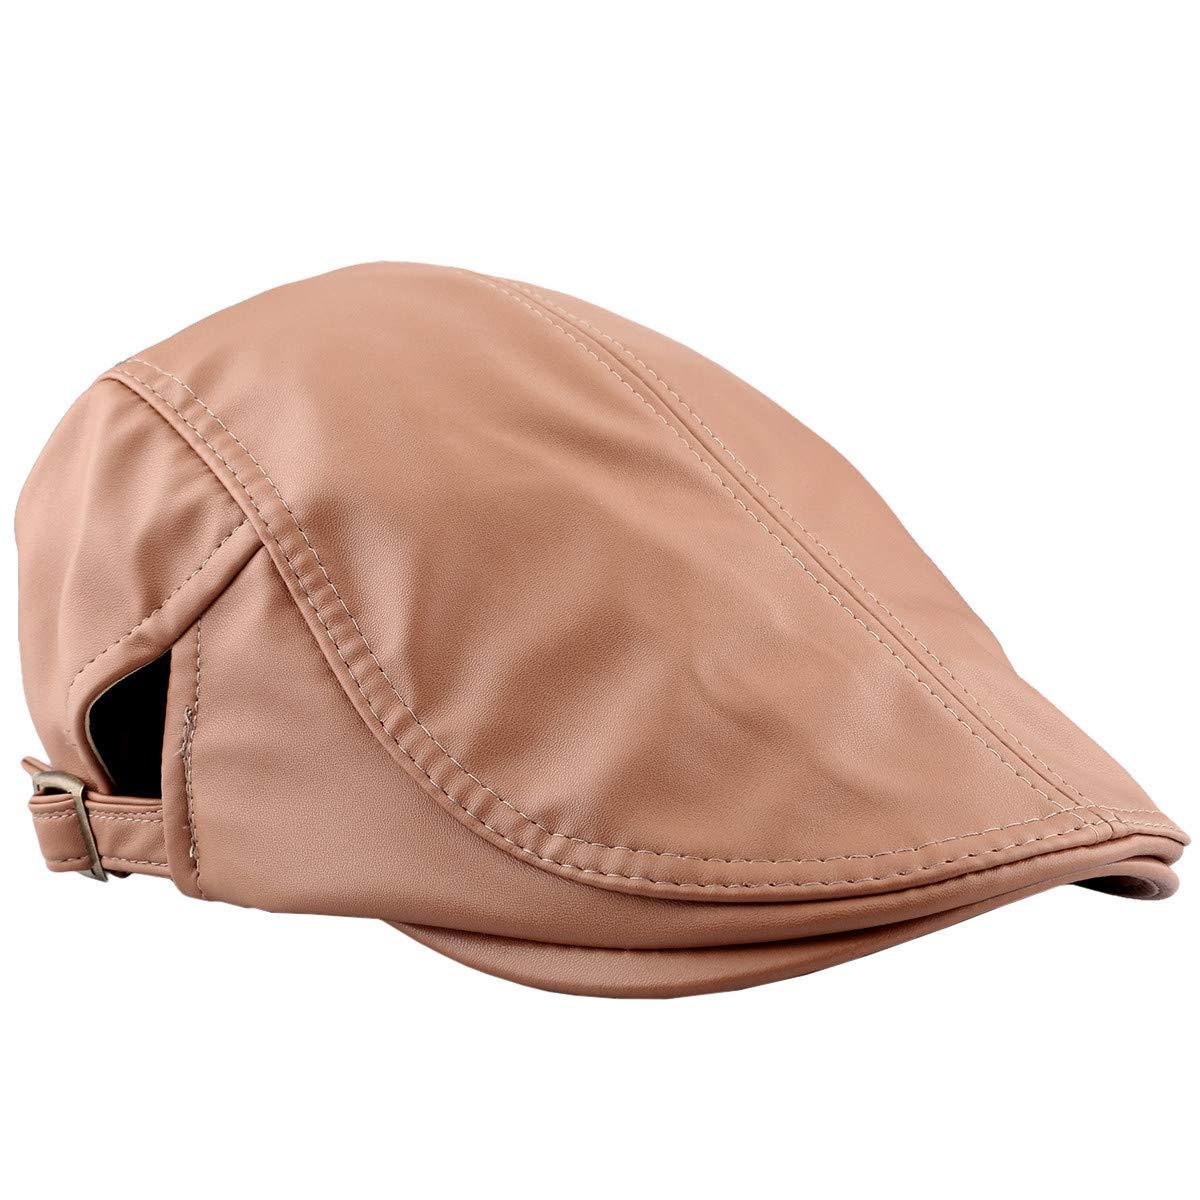 KYEYGWO Flat Caps Men, PU Leather Newsboy Peaked Cabbie Ivy Gatsby Beret Hat Driving Cap EYOW0008401